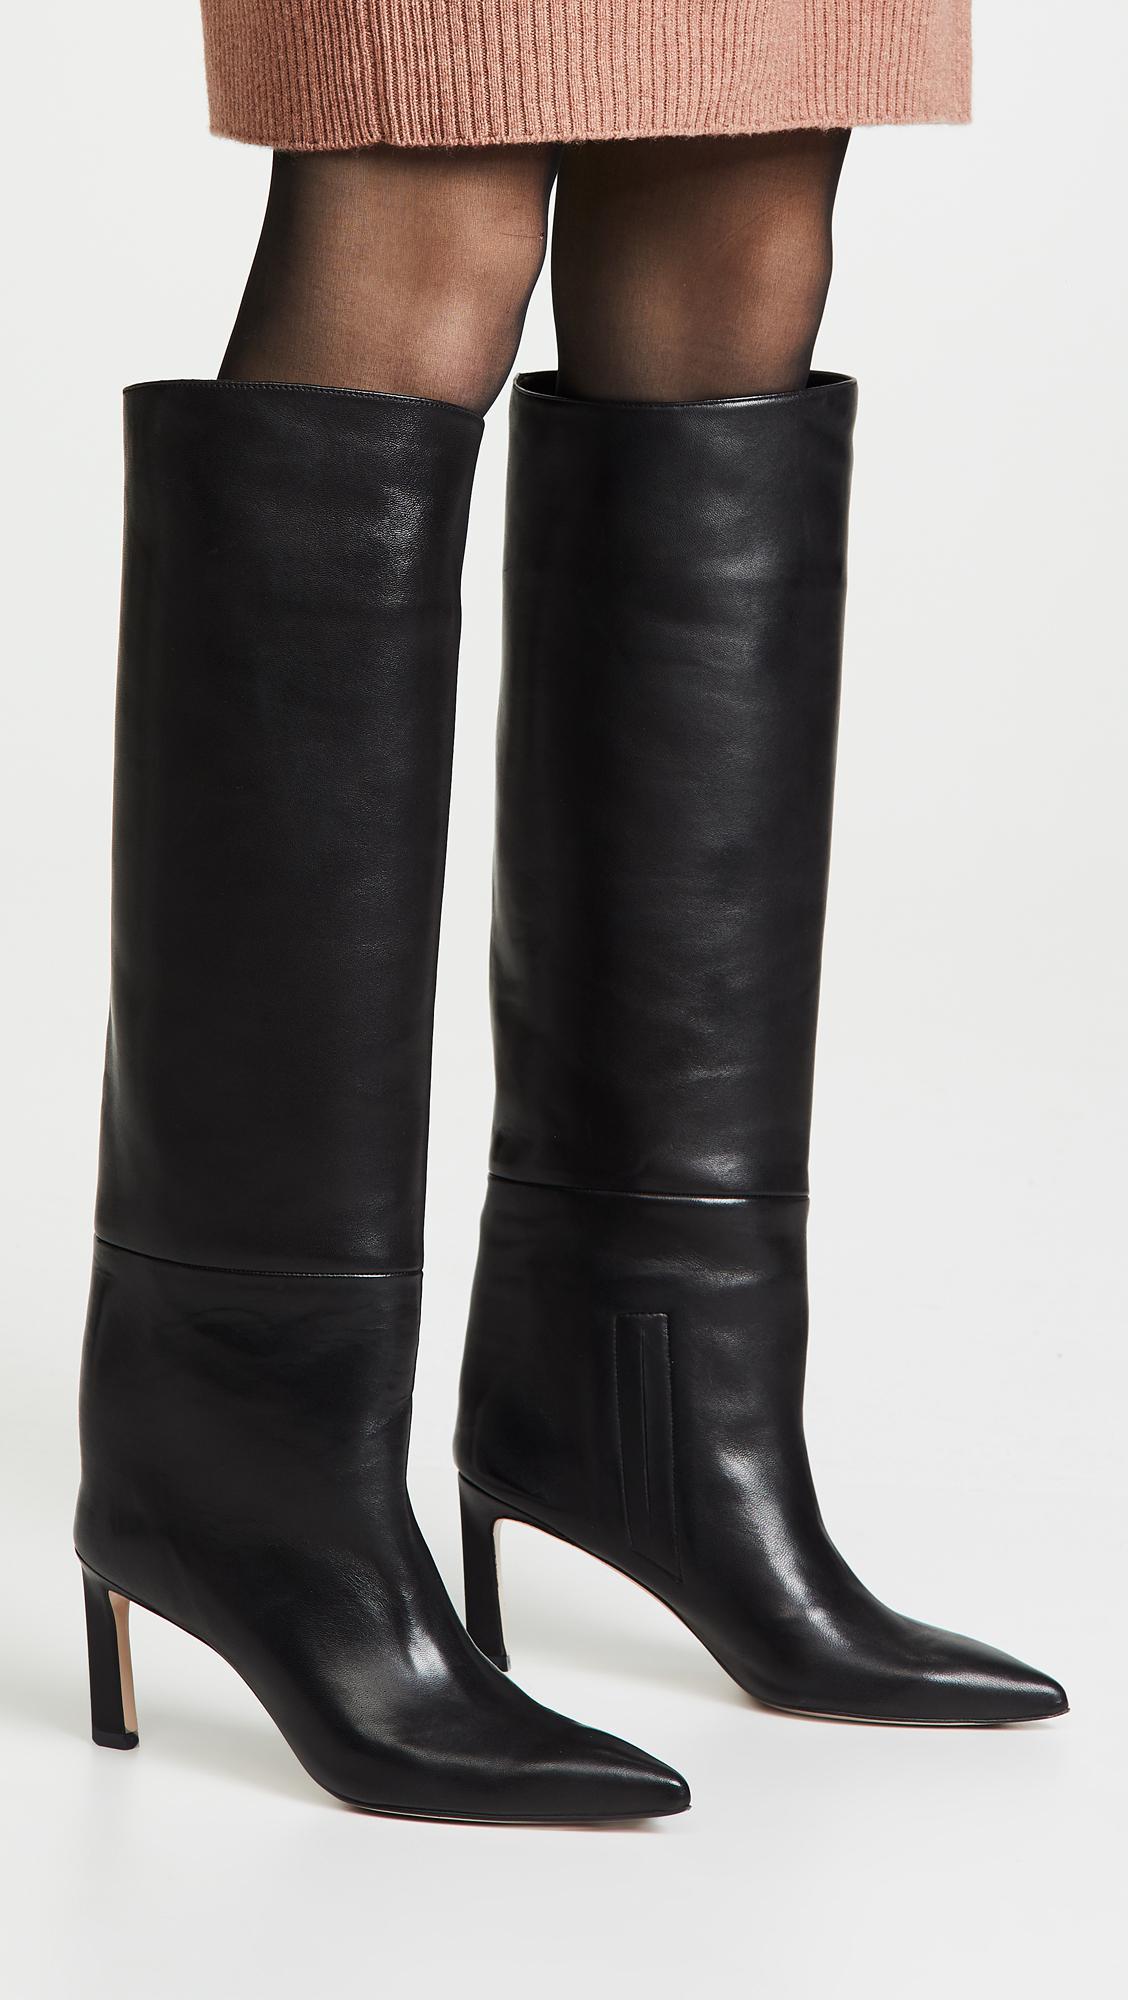 29128f5aeb2 Stuart Weitzman - Black Emiline Boots - Lyst. View fullscreen